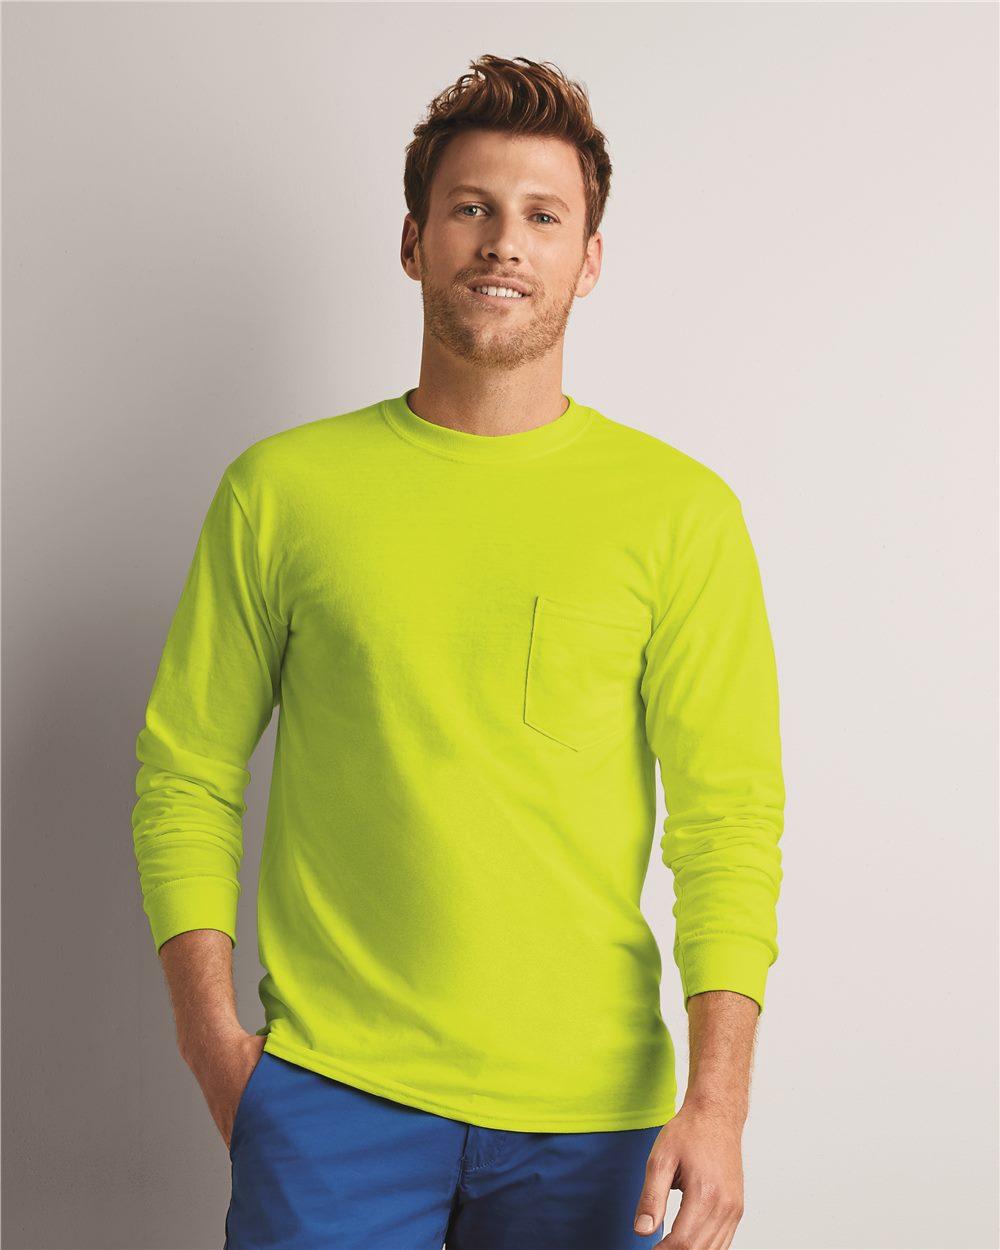 Gildan 2410 Ultra Cotton Long Sleeve T-Shirt with a ...